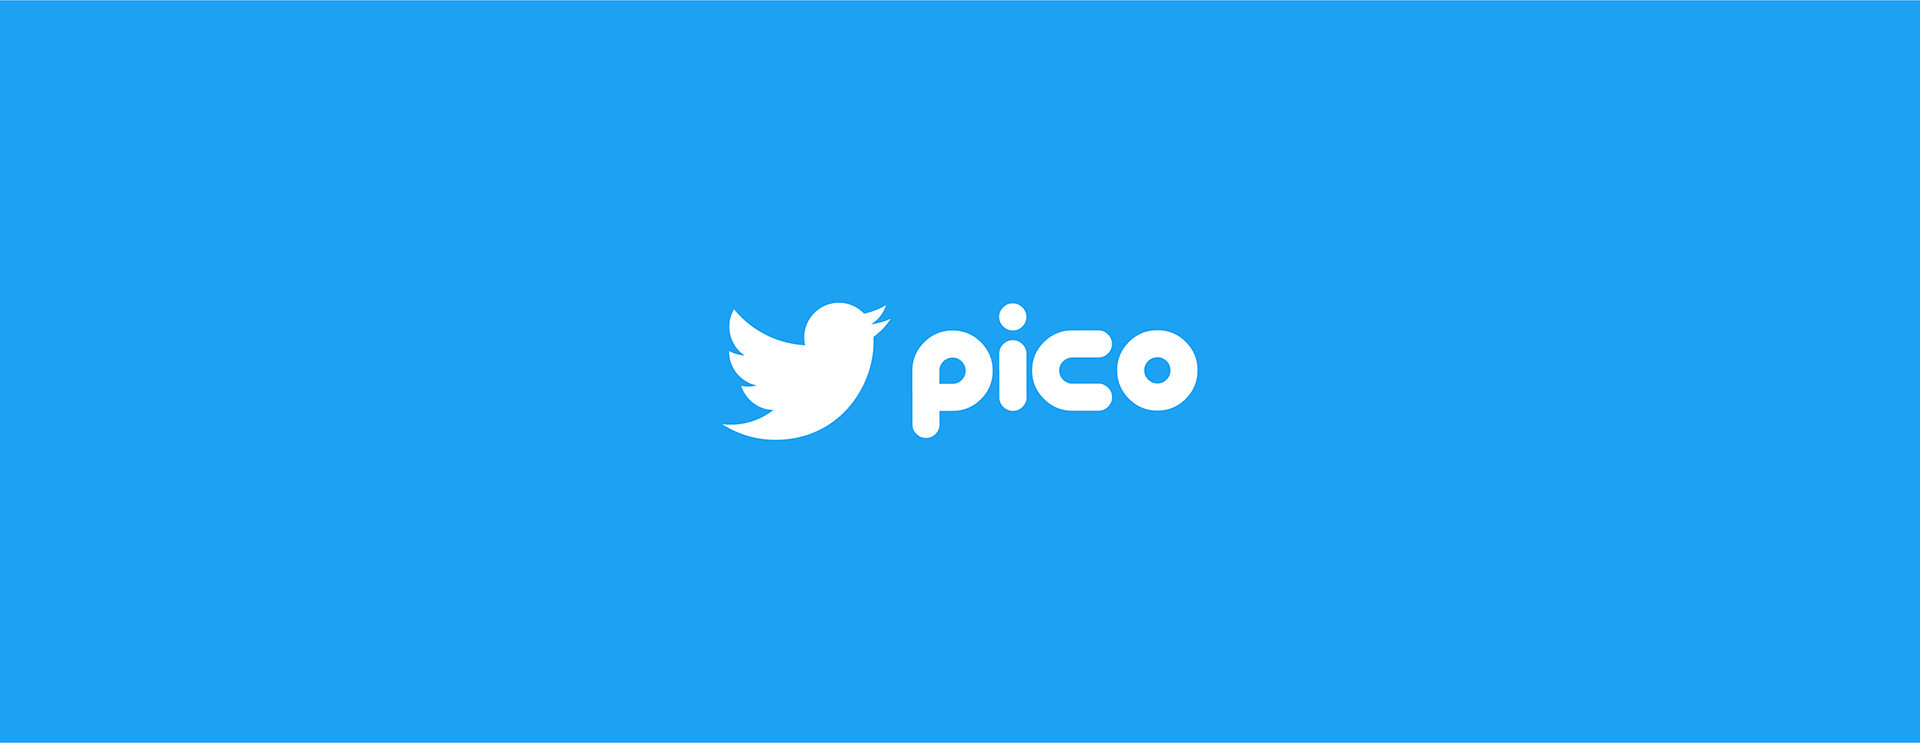 logo-fonts-design-brands-creative-7